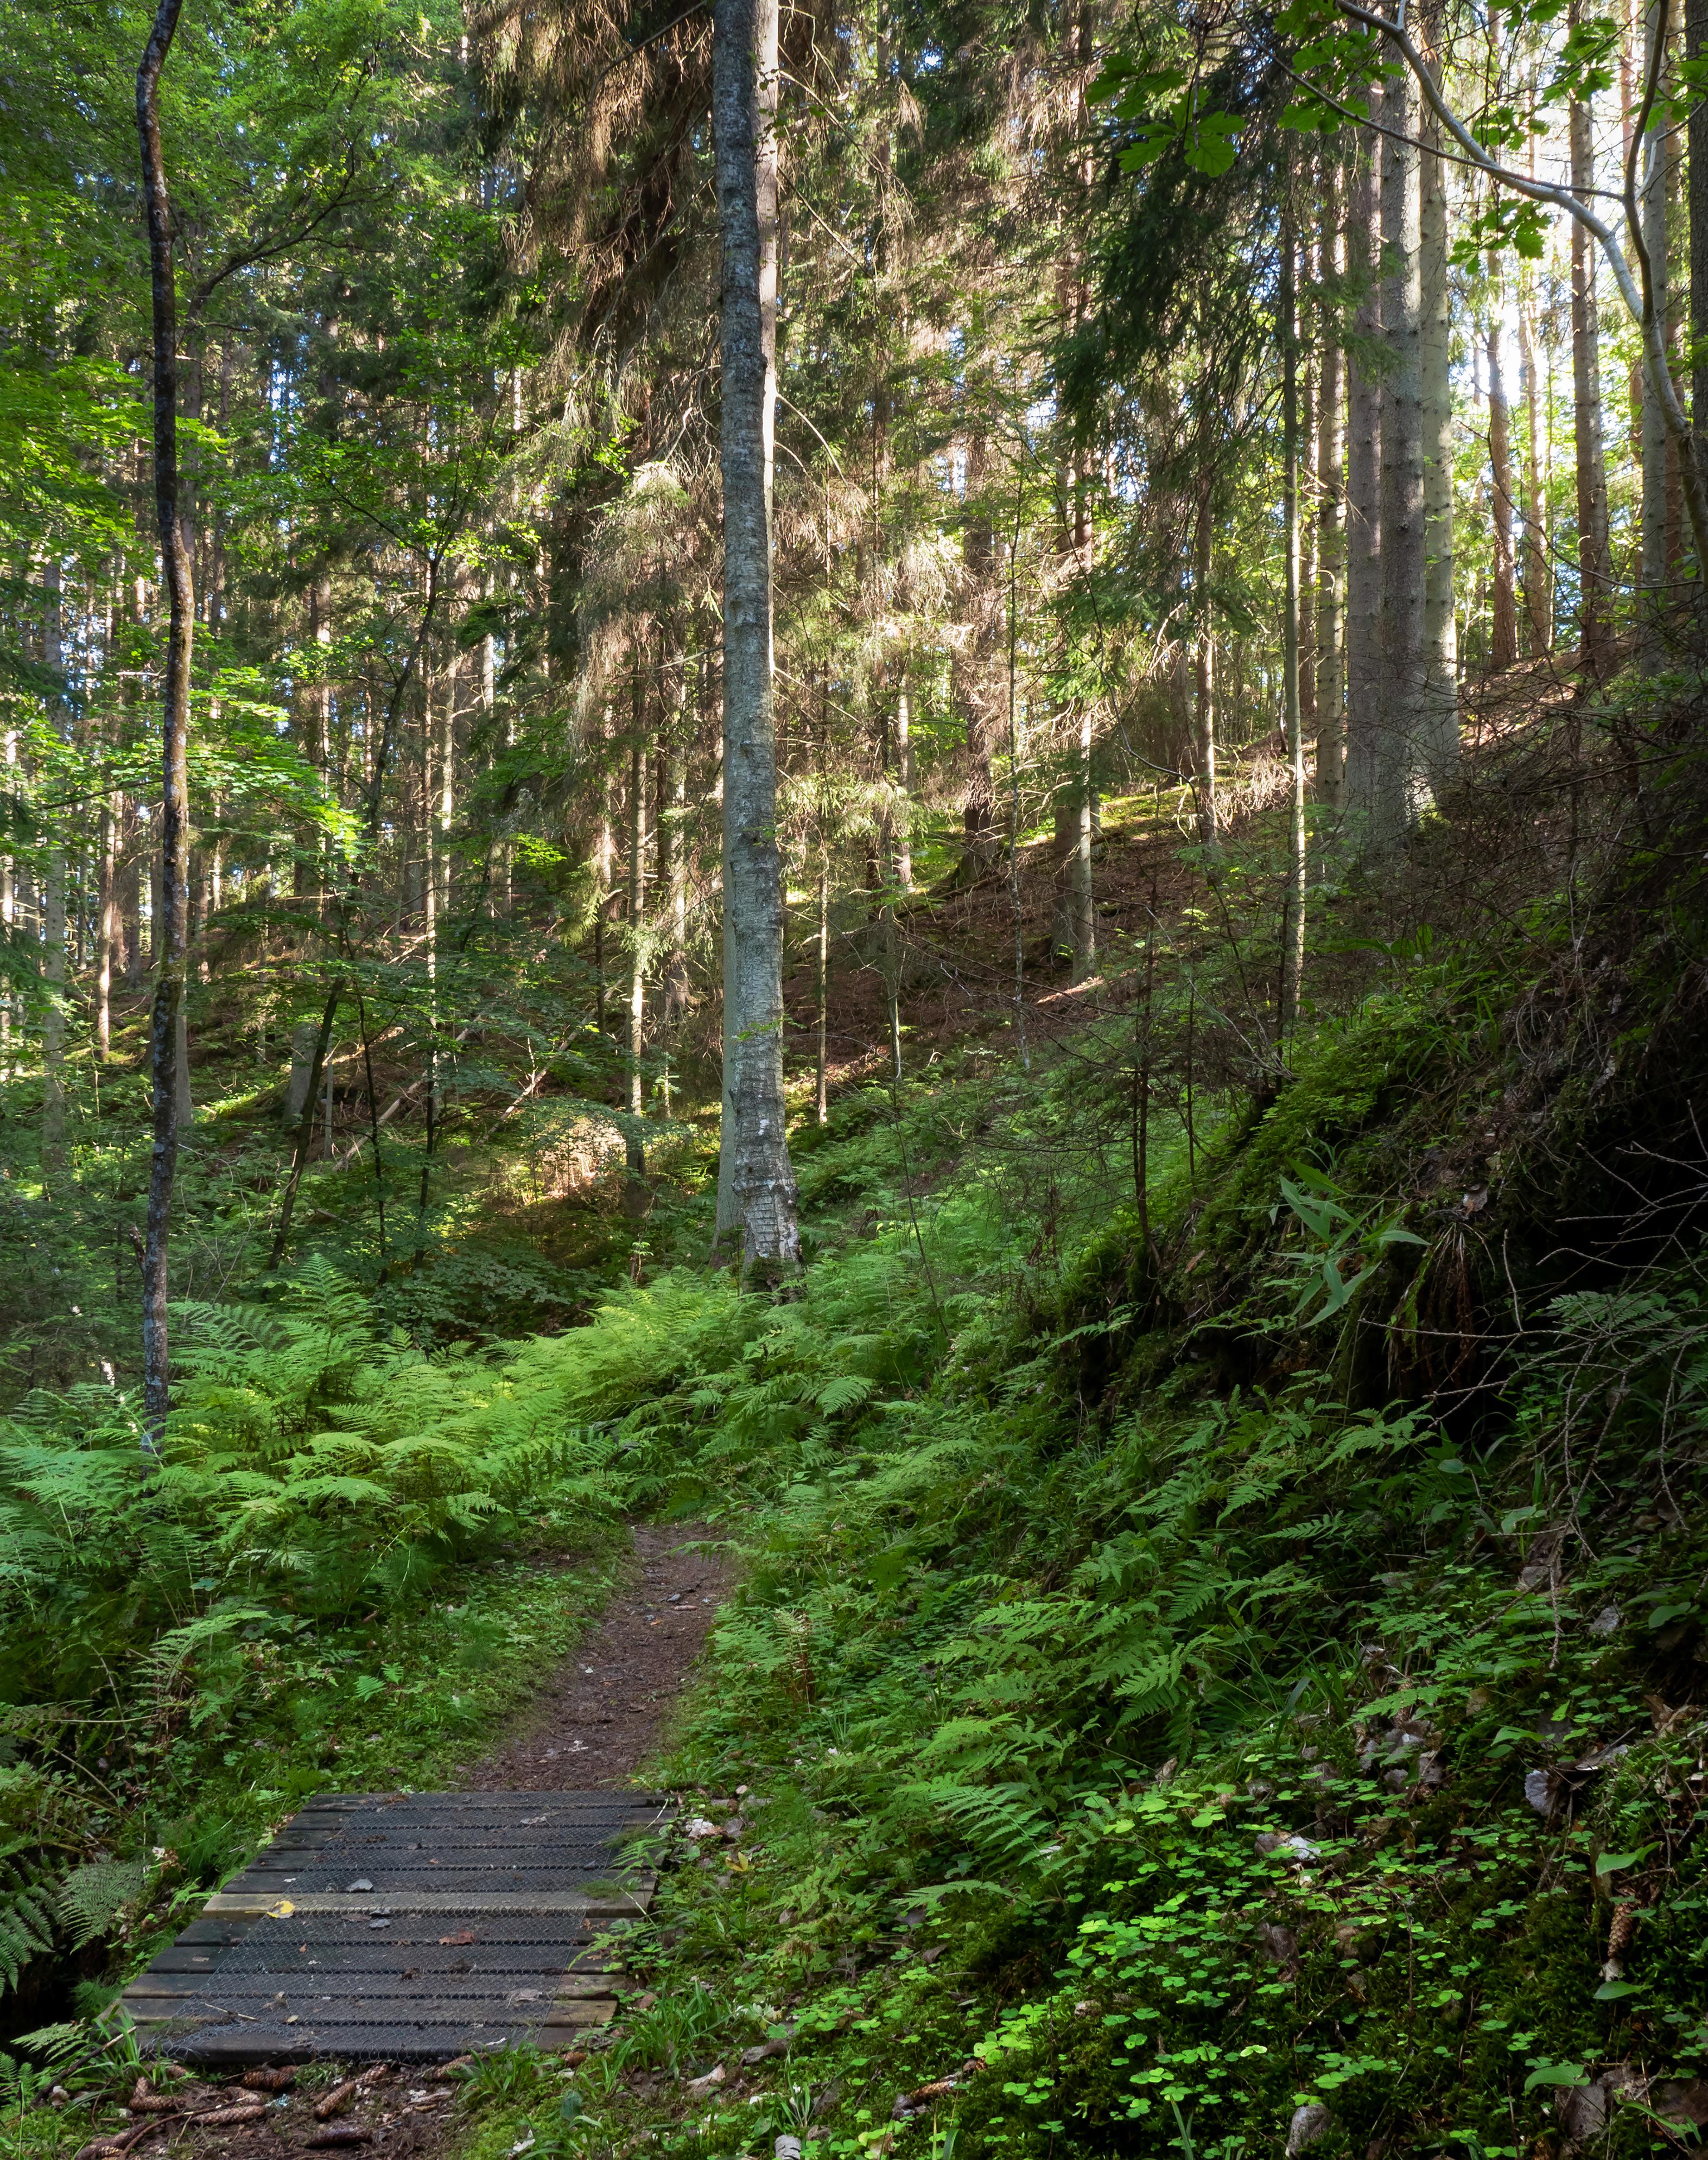 Footbridge and a sunny slope in Gullmarsskogen ravine, Ferns, Footbridge, Forest, Gullmarsskogen, HQ Photo